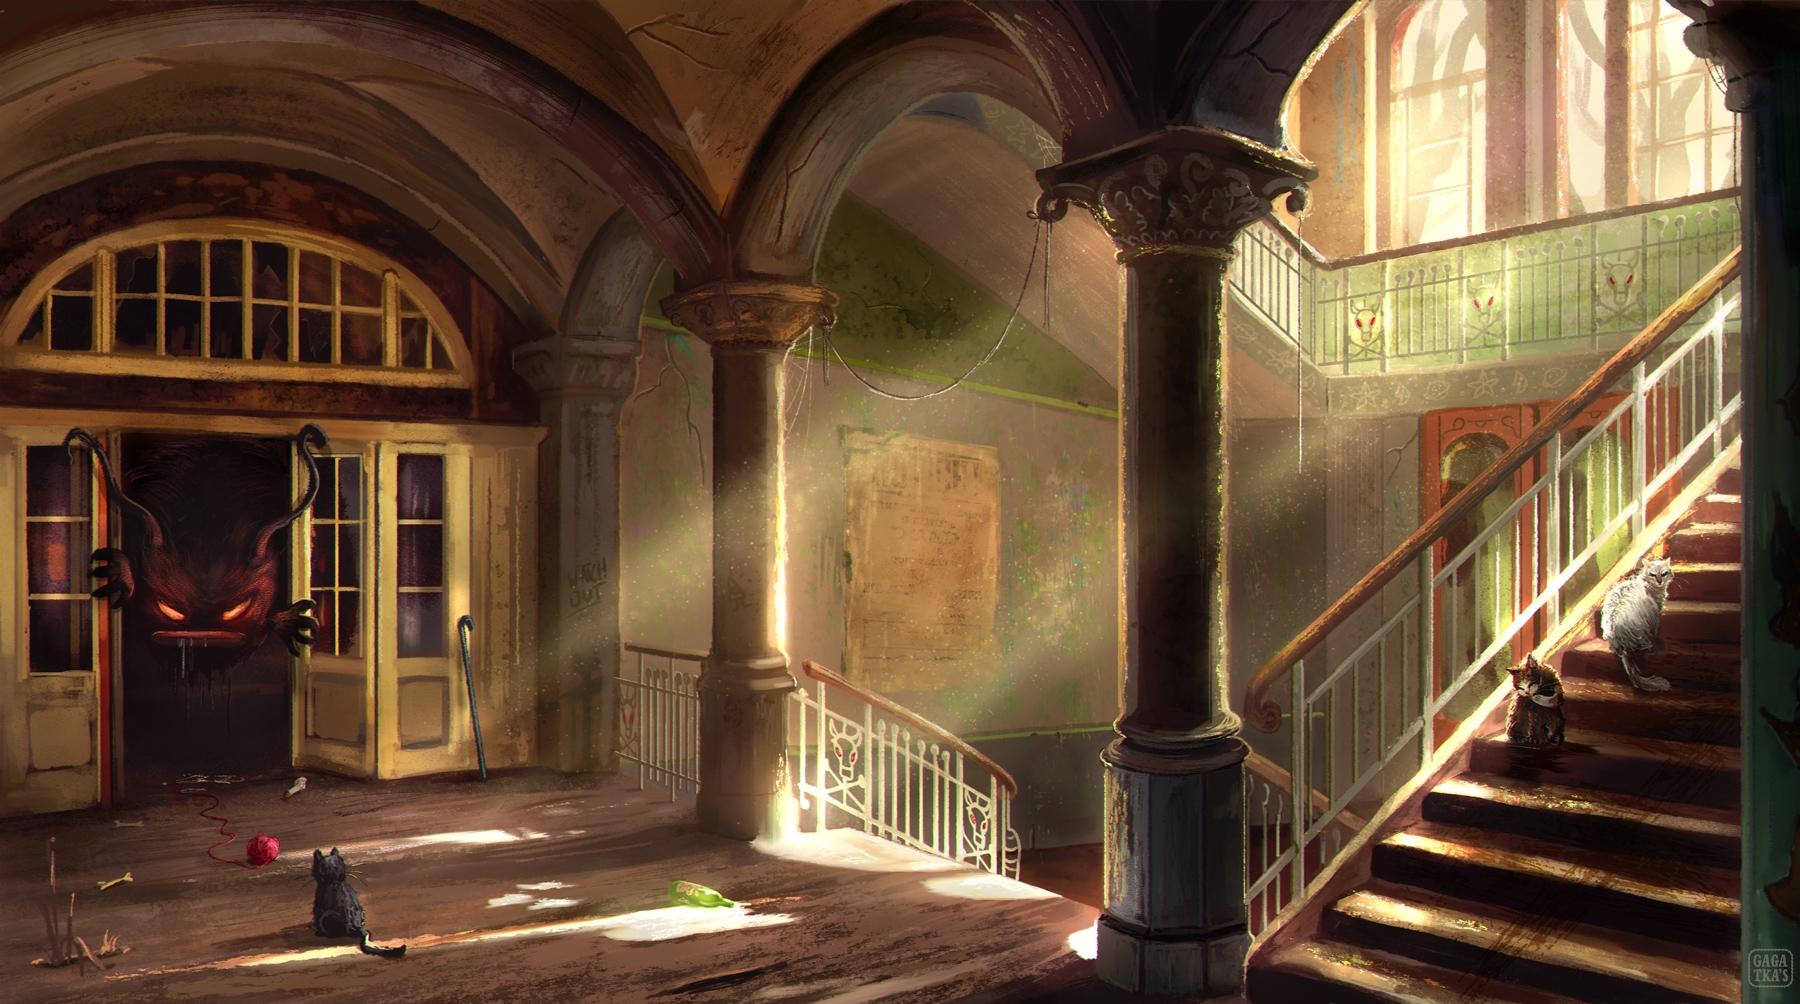 Haunted house :) Hope guys - ti - gagatka | ello